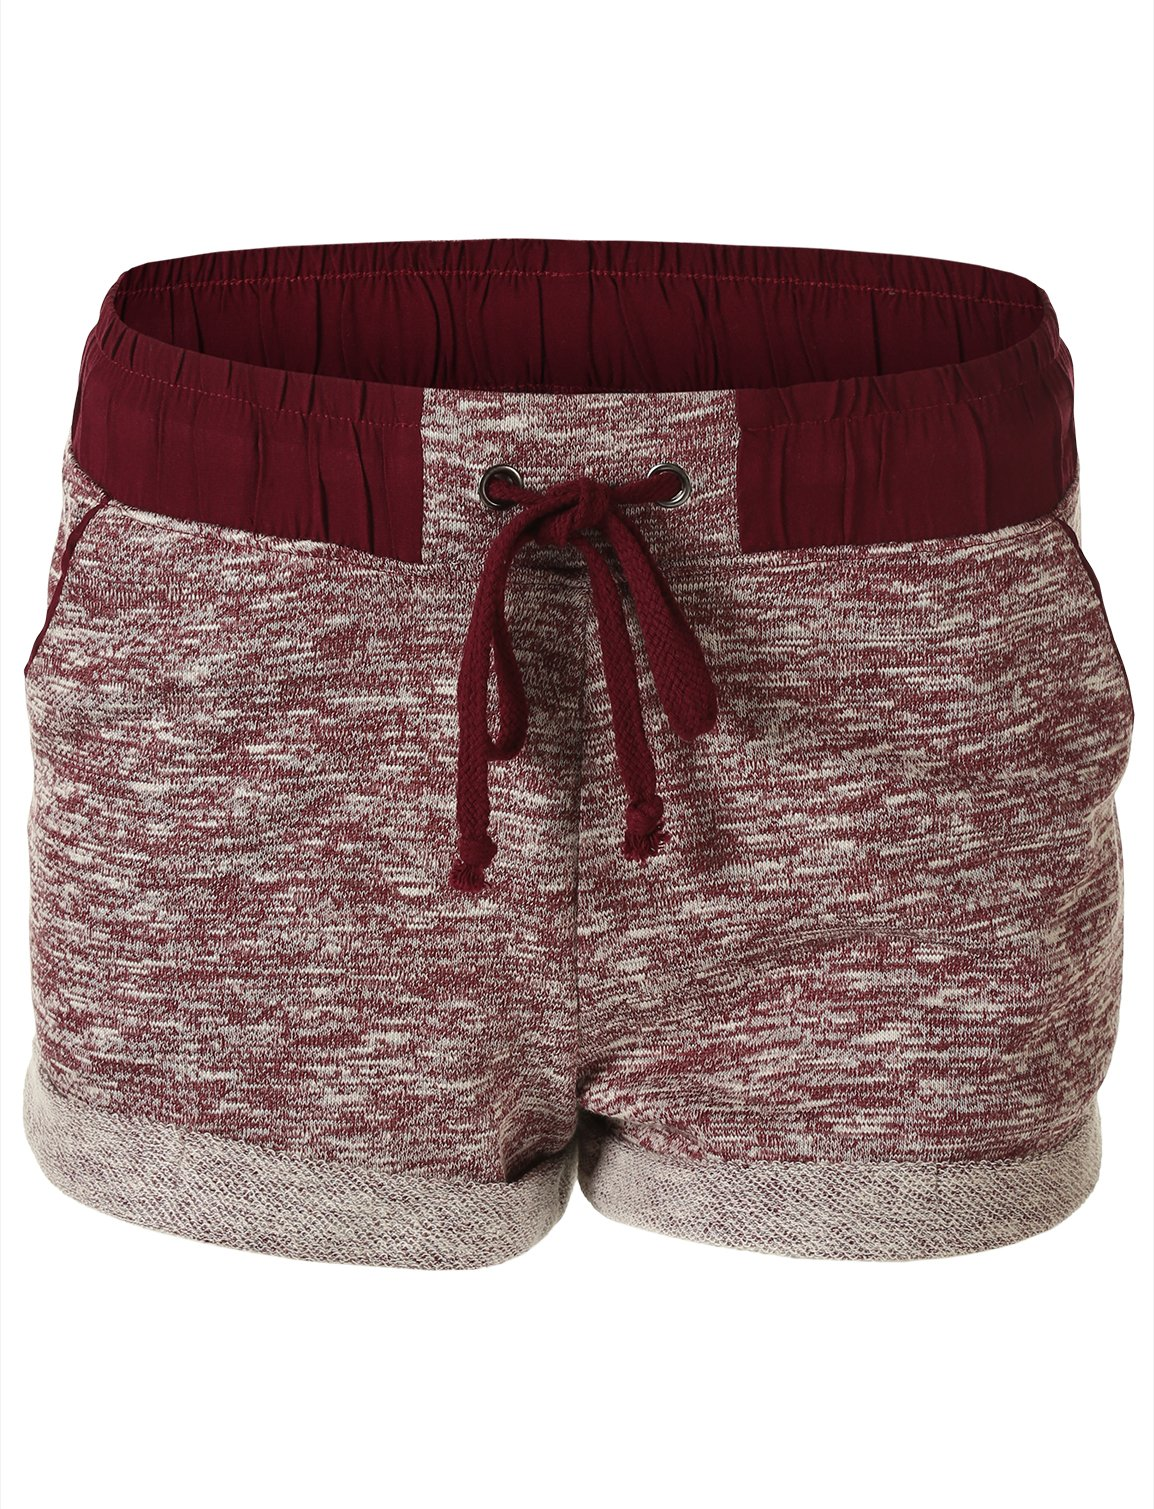 FHnLove Women's Plus Size Marled French Terry Drawstring Cuffed Shorts Burgandy 2XL